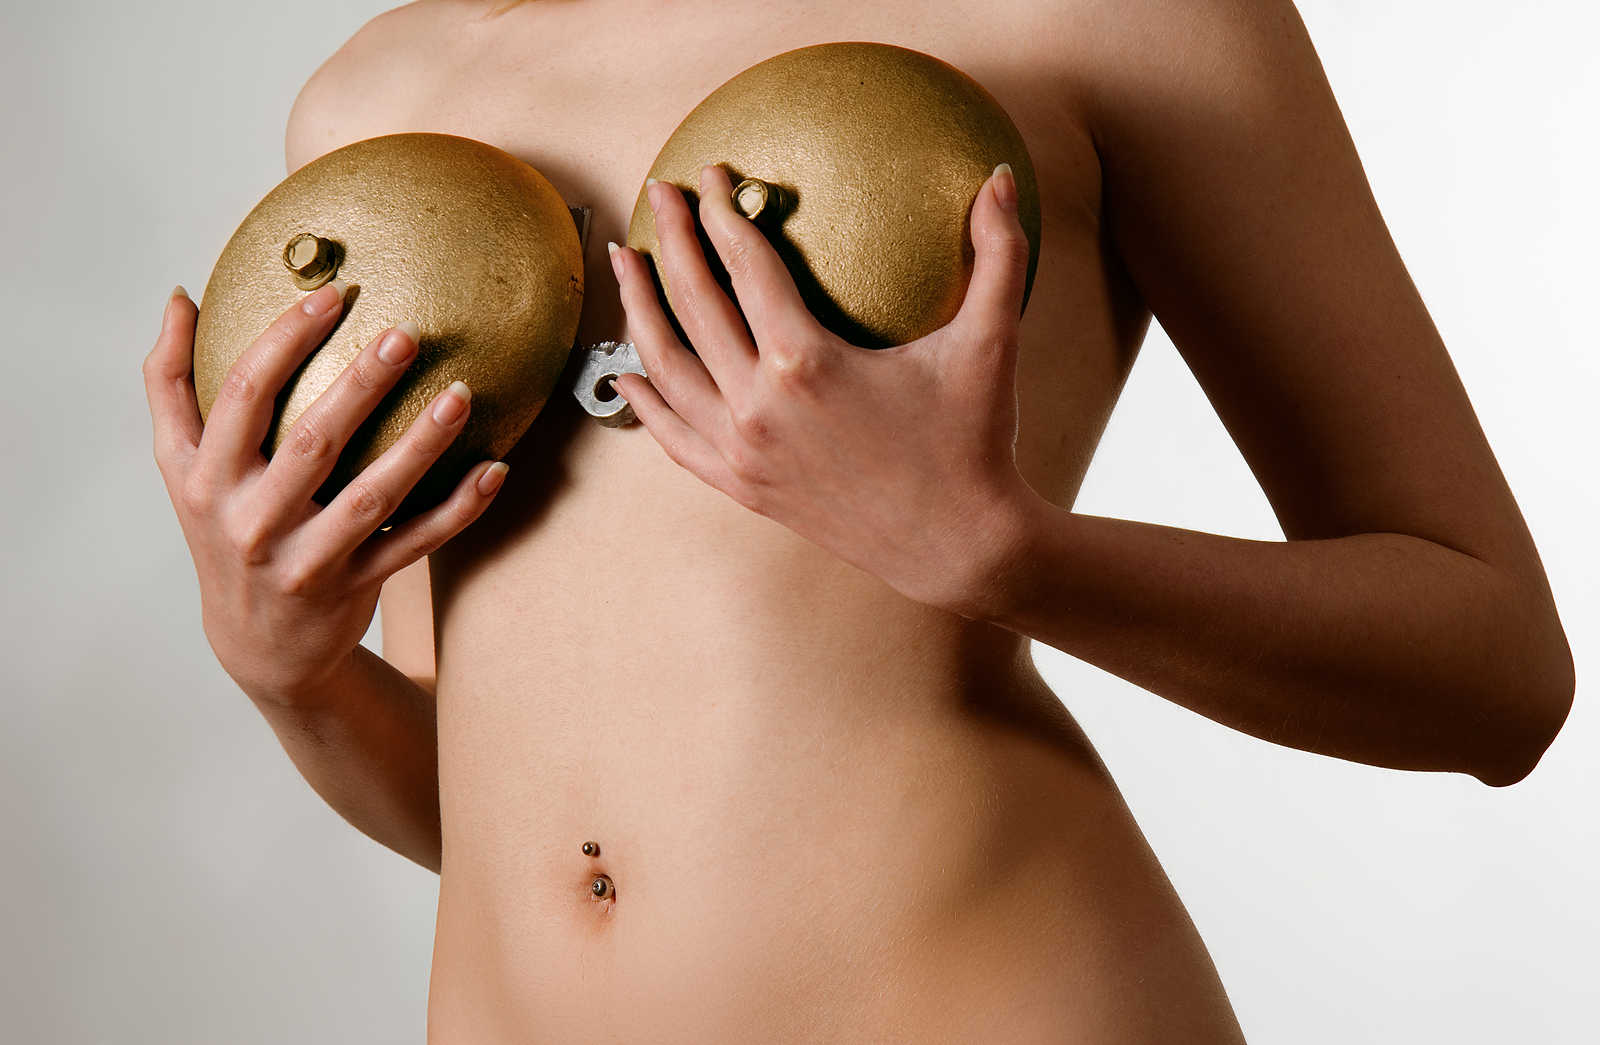 bigstock-Beautiful-woman-holding-golden-17553356.jpg